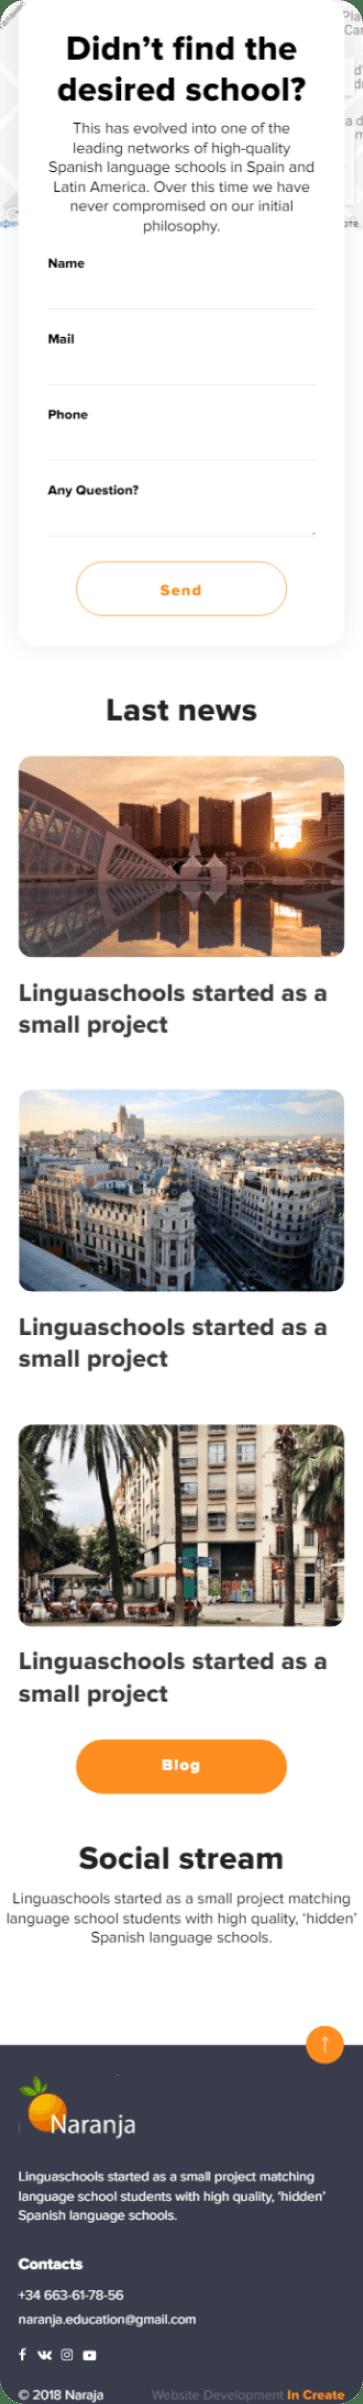 NARANJA SCHOOL - INCREATE